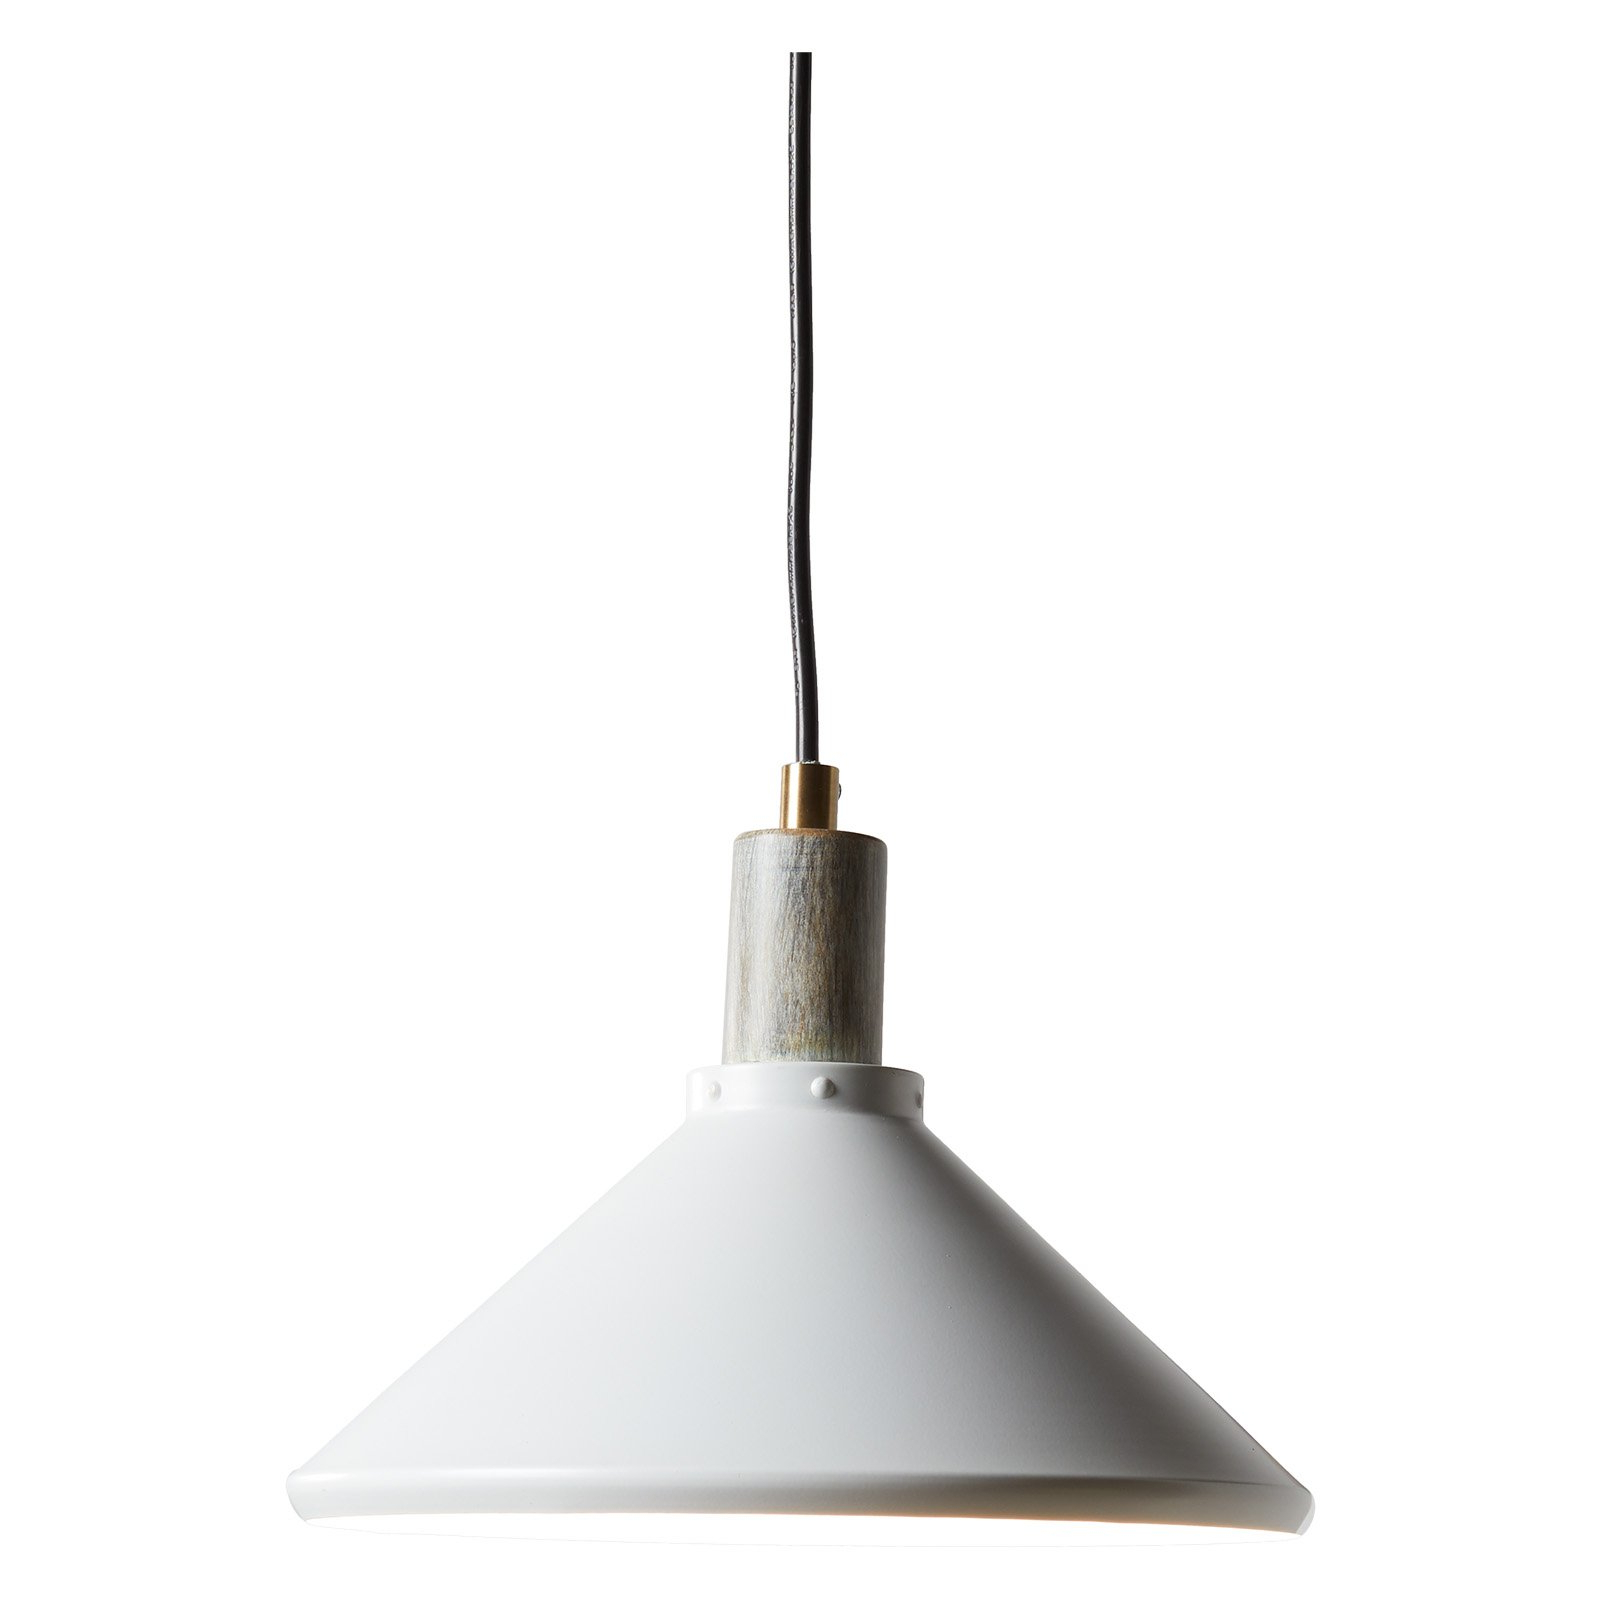 Favorite Abordale 1 Light Single Dome Pendants In Modrn Scandinavian Wide Pendant Light (View 17 of 20)